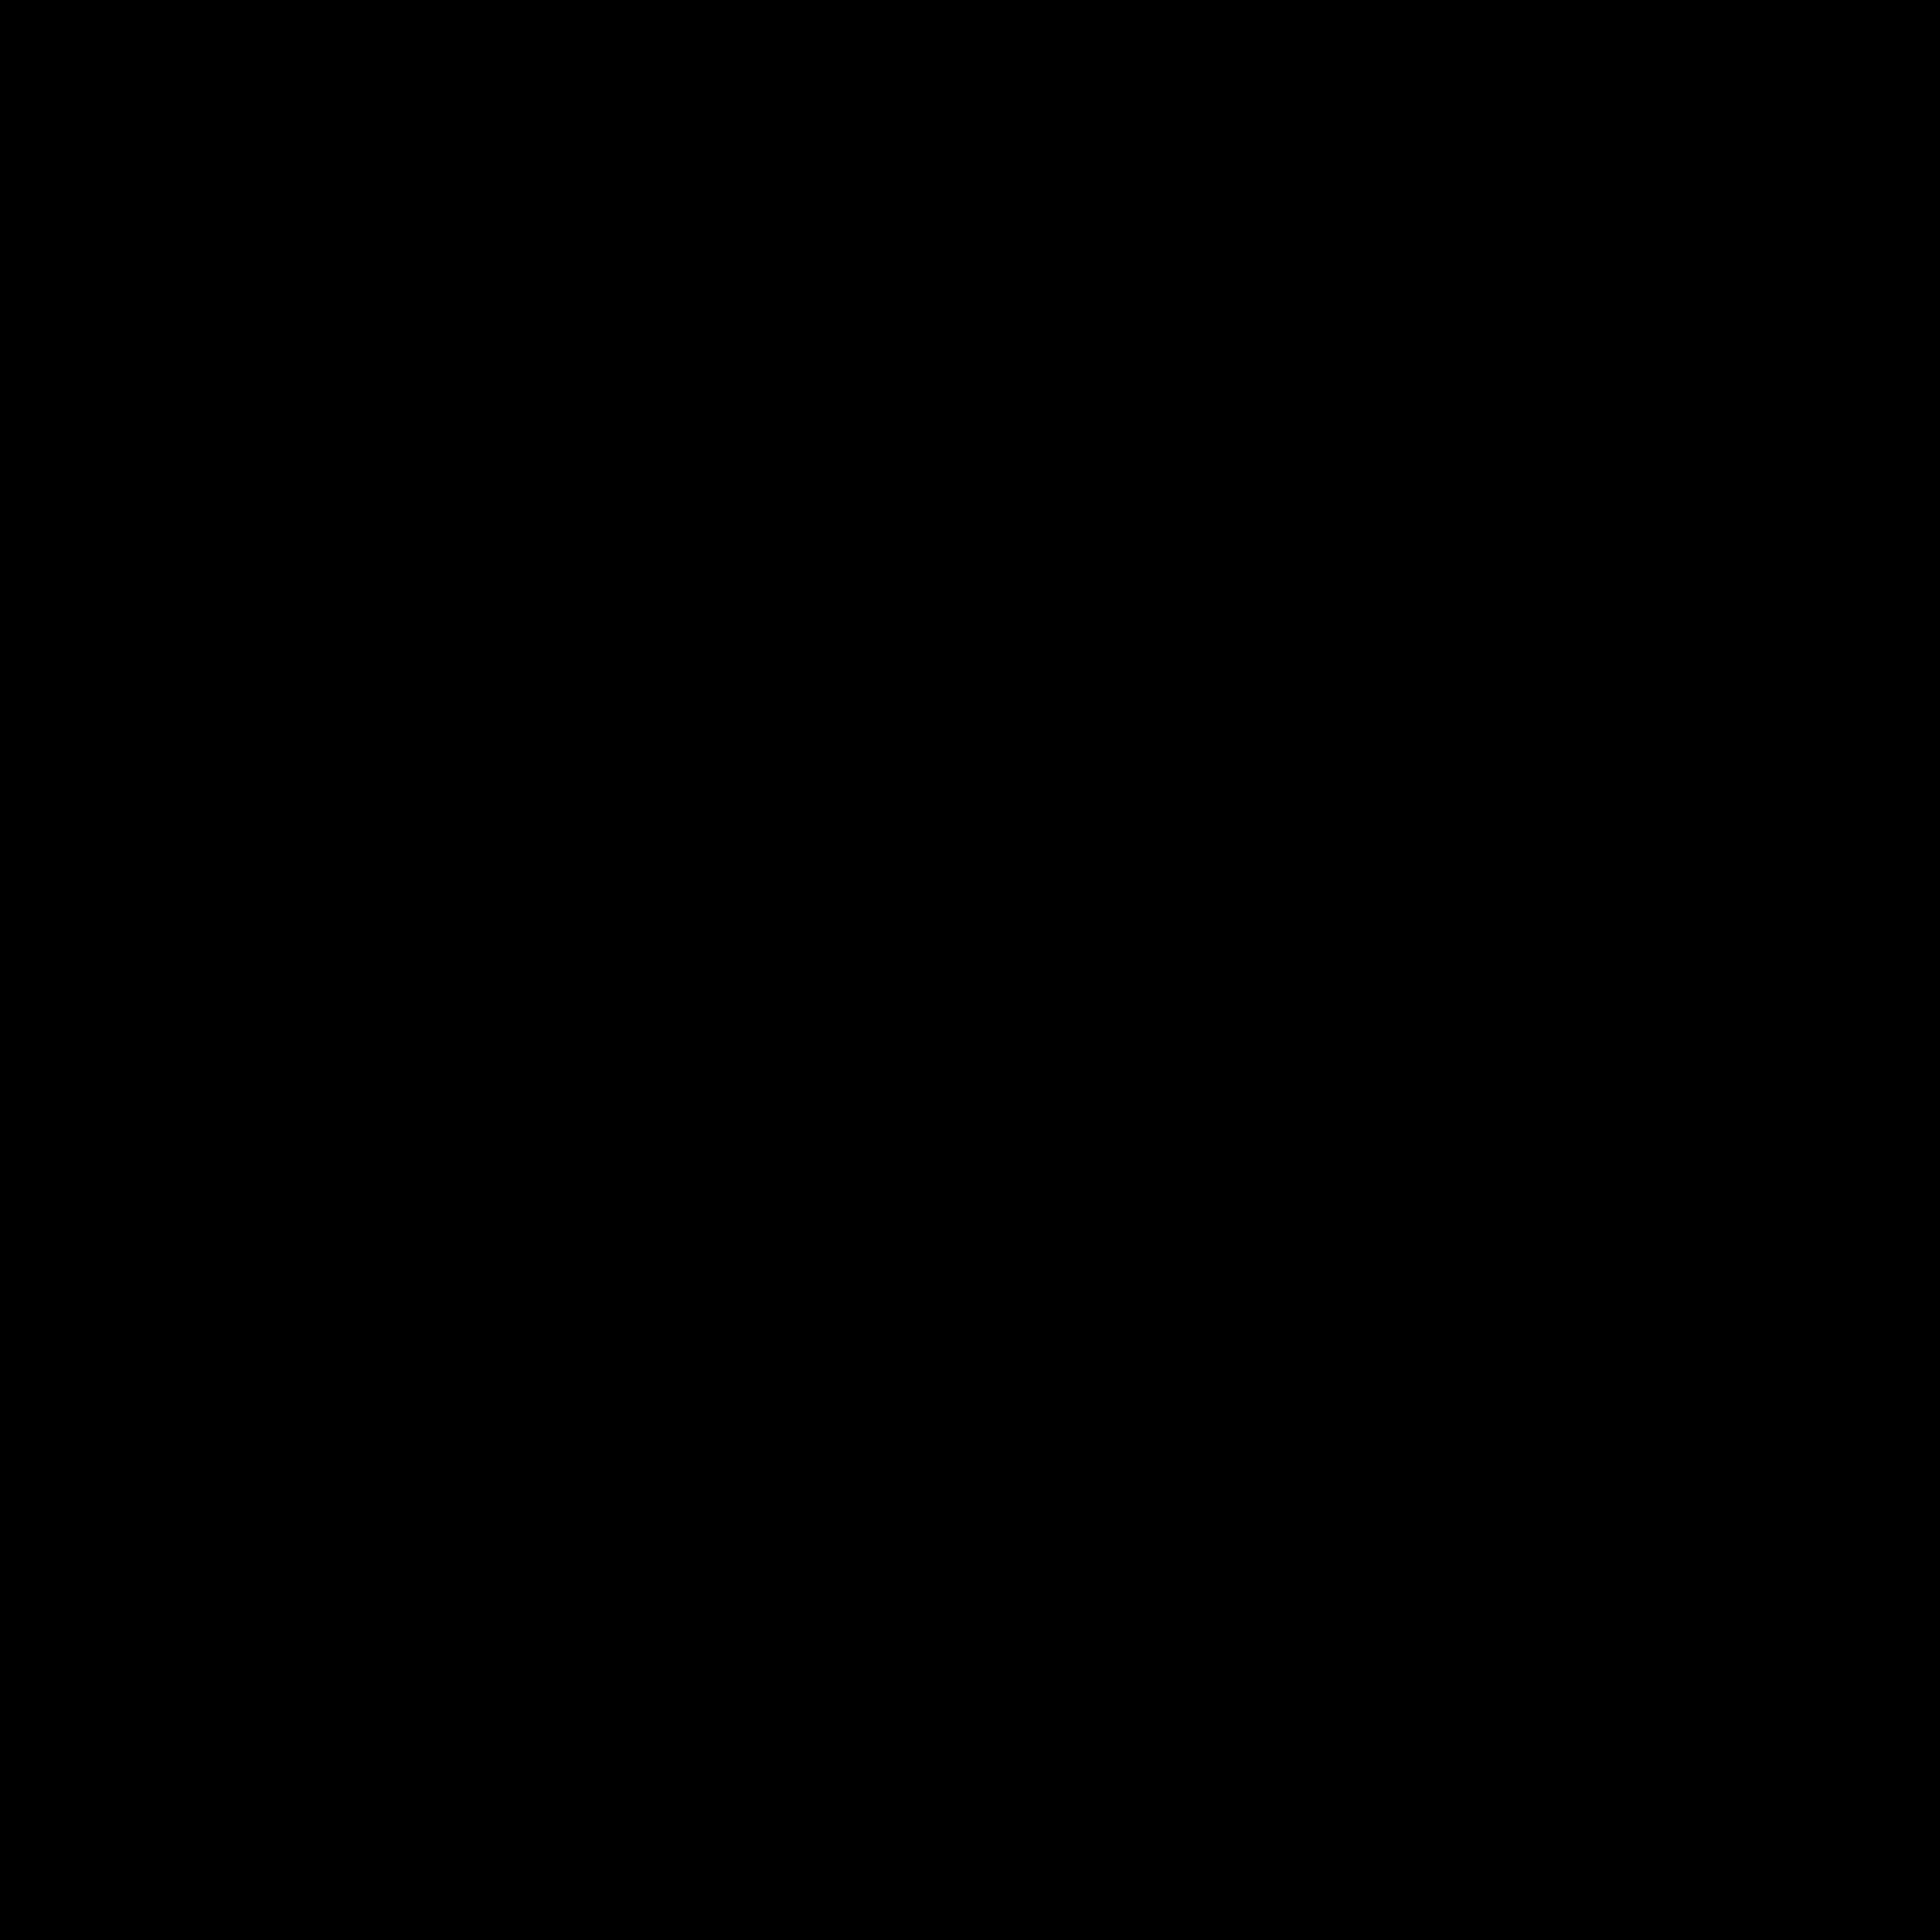 2000x2000 Quill Clipart Transparent